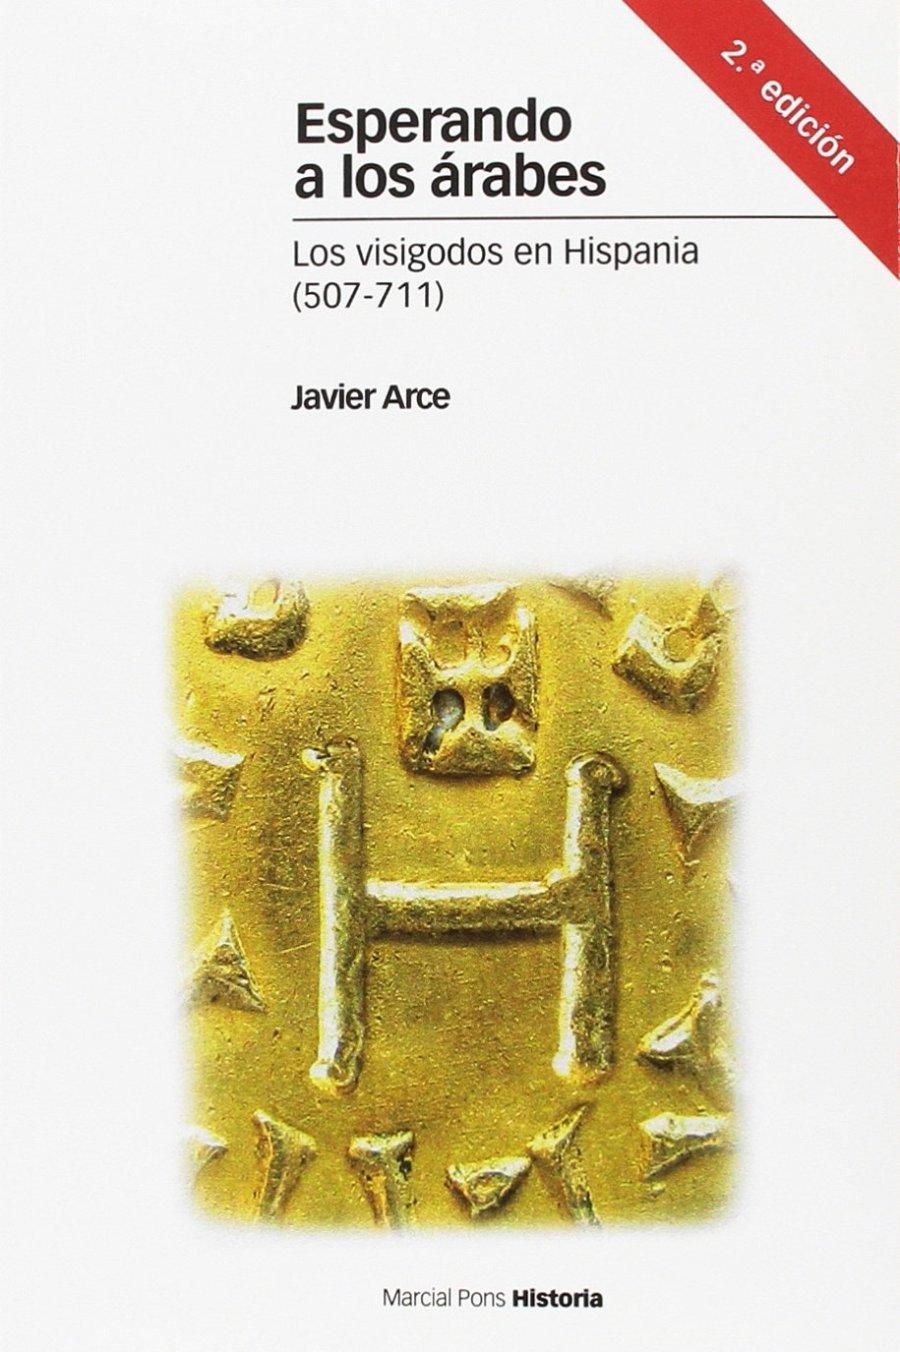 Esperando a los árabes: Los visigodos en Hispania (507 - 711) 2ª edición Book Cover